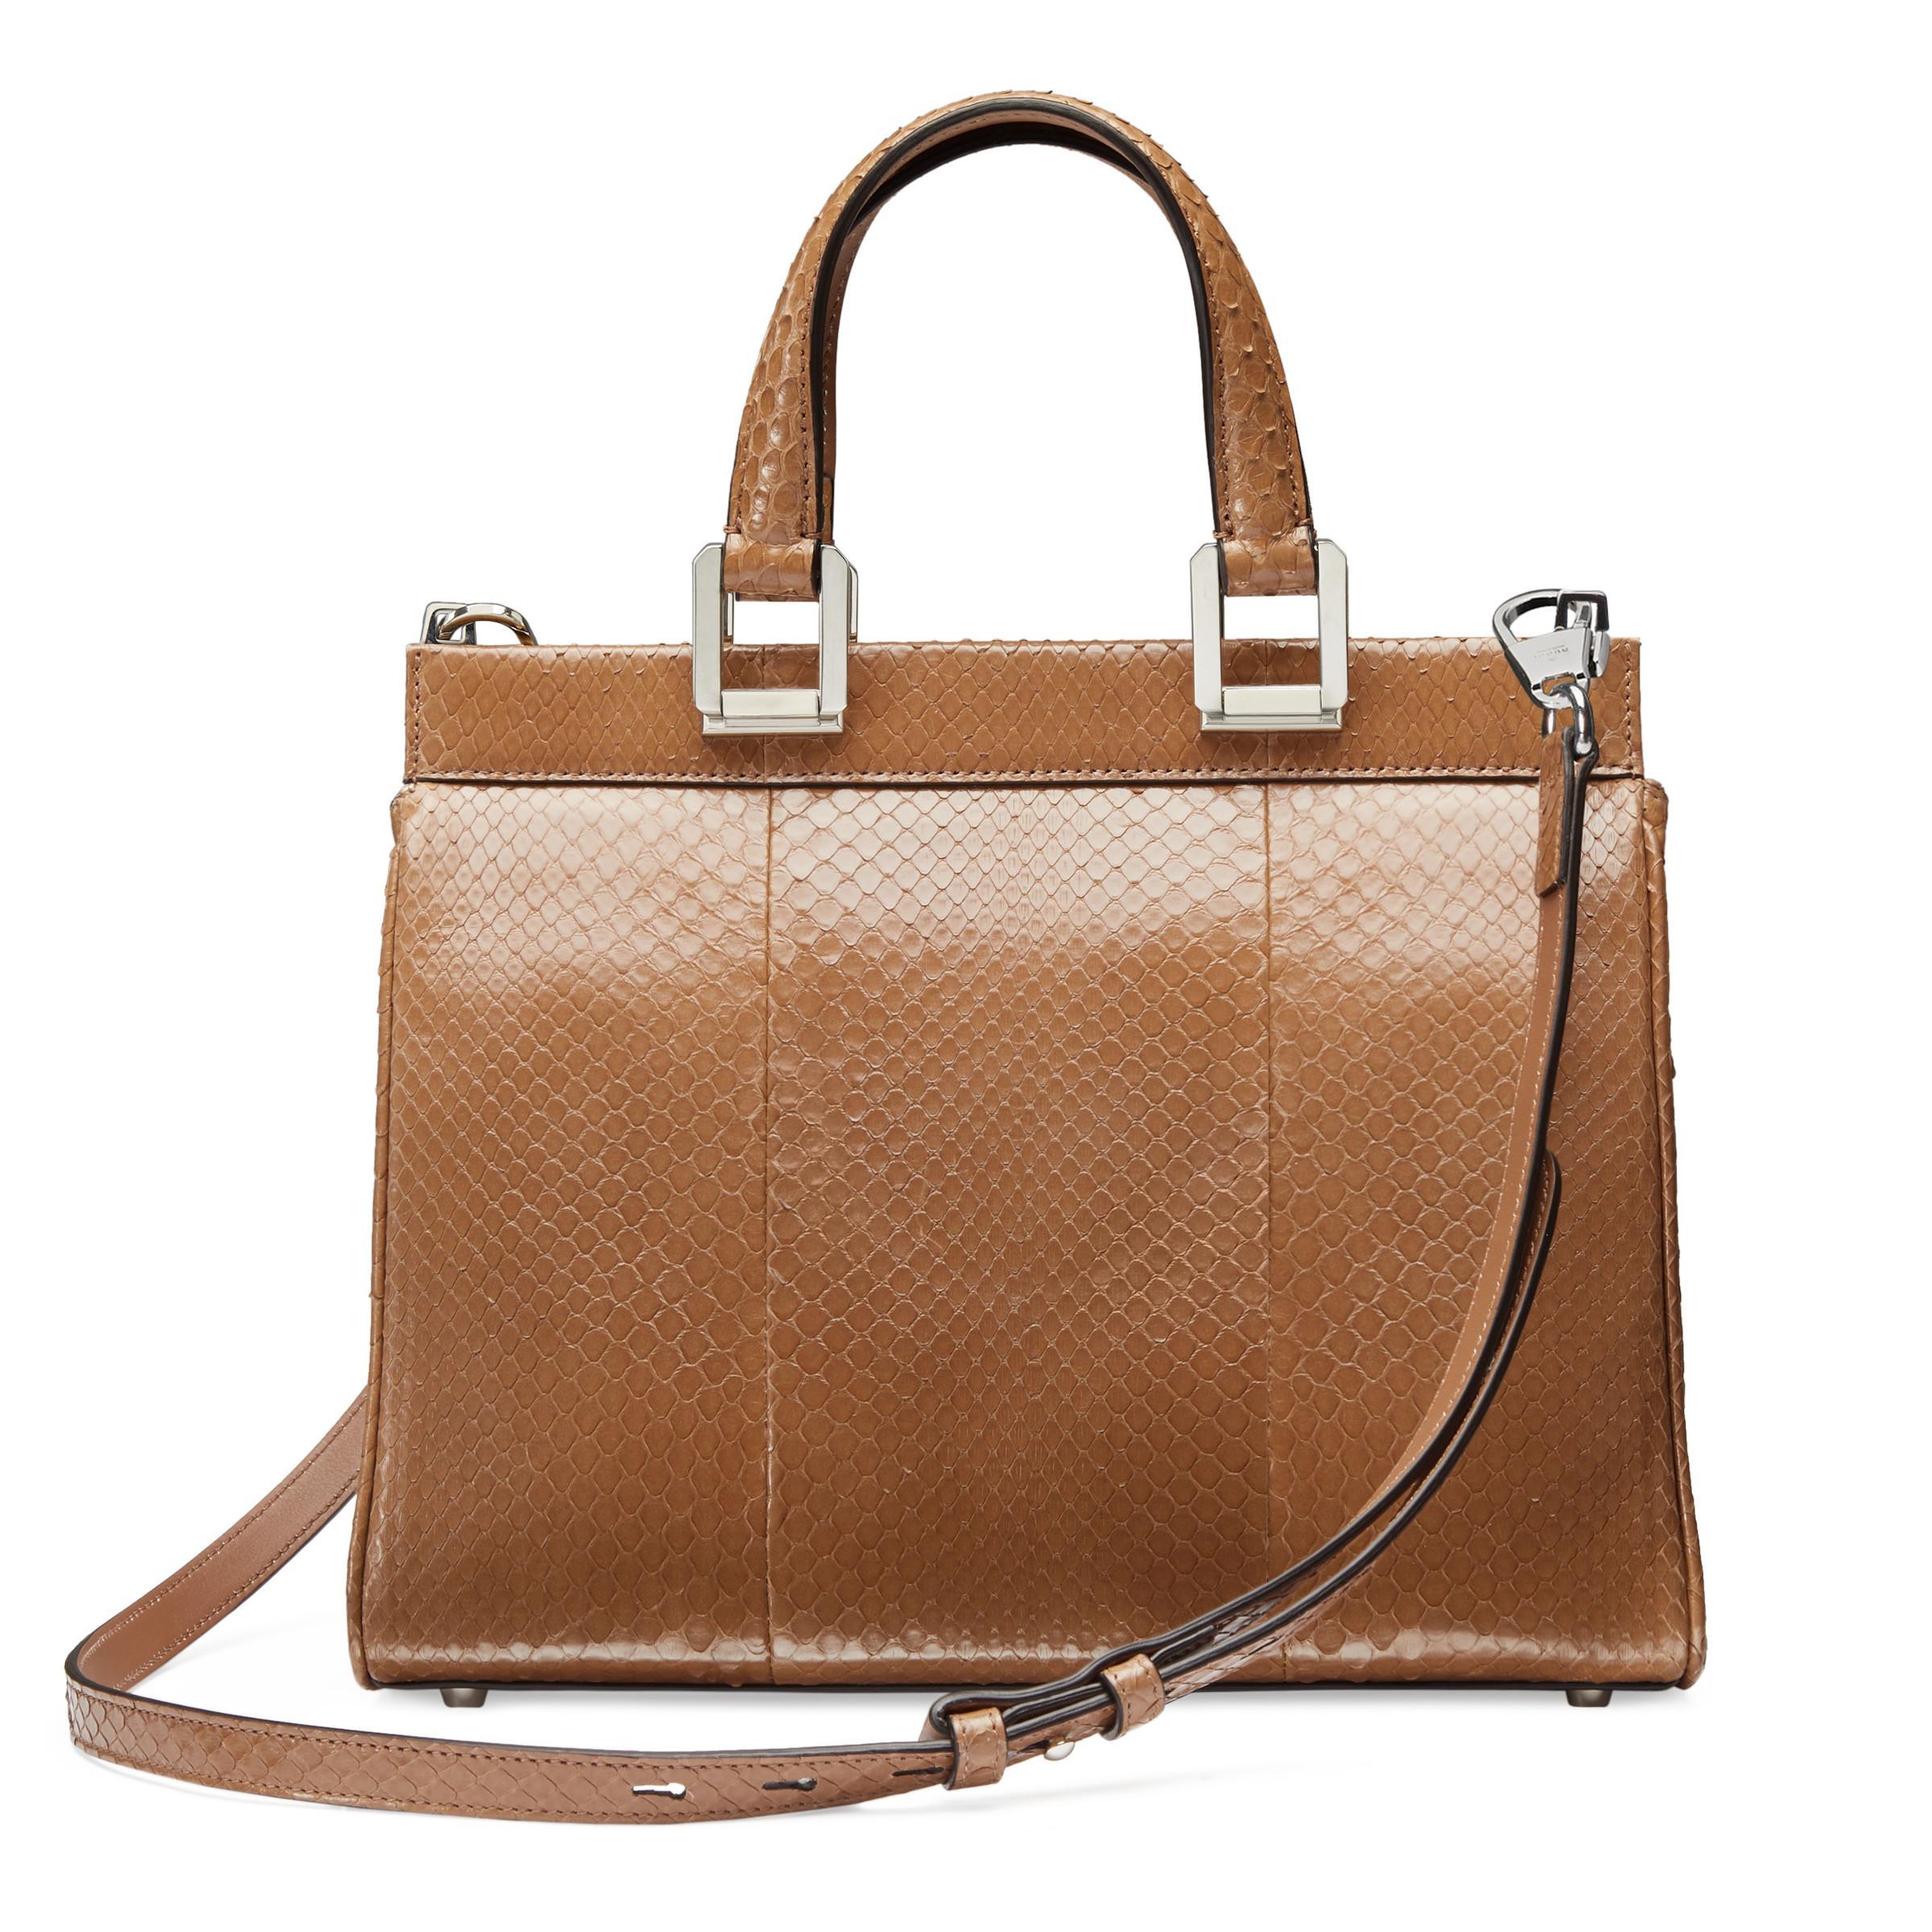 e13374b2e26 Gucci - Natural Zumi Snakeskin Small Top Handle Bag - Lyst. View fullscreen